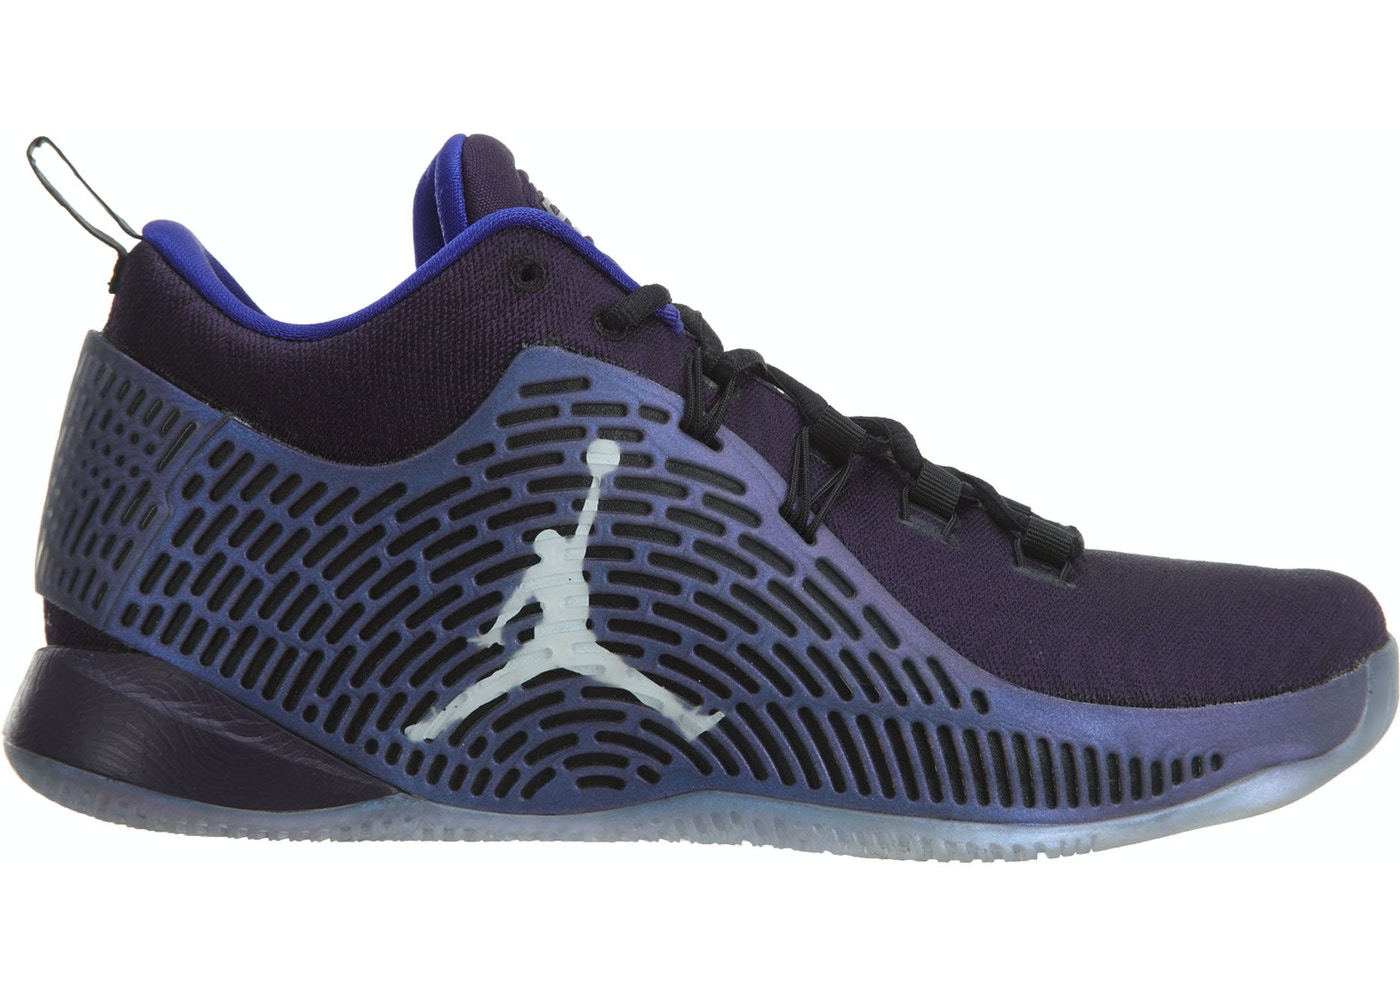 factory authentic 0e5a1 c6023 Jordan Cp3.X Purple Dynasty/Metallic Silver